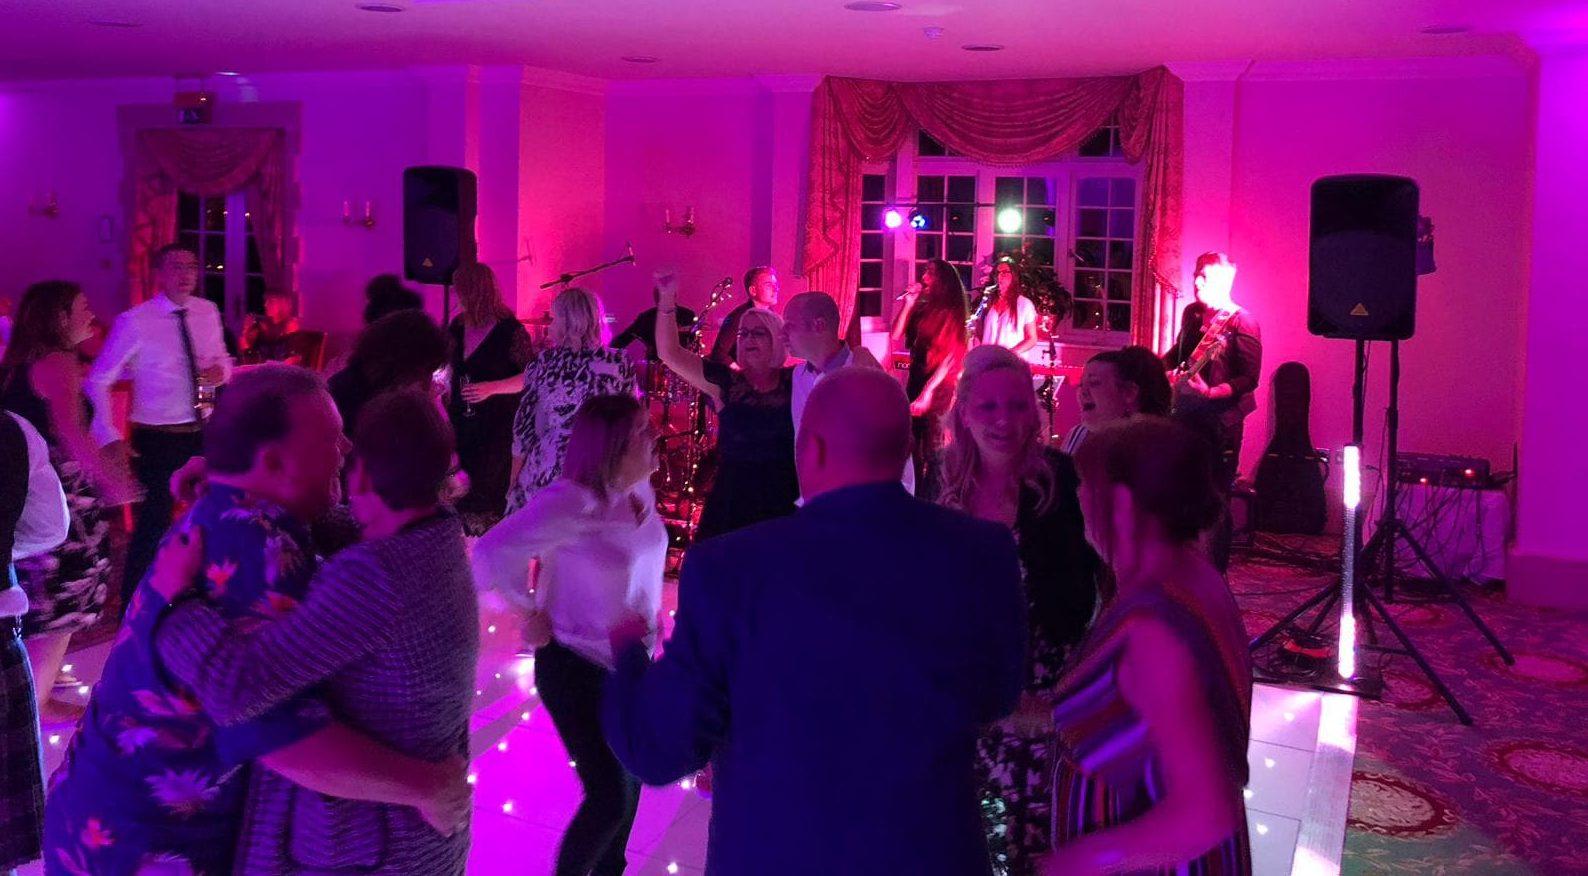 Wedding dance floor with live music